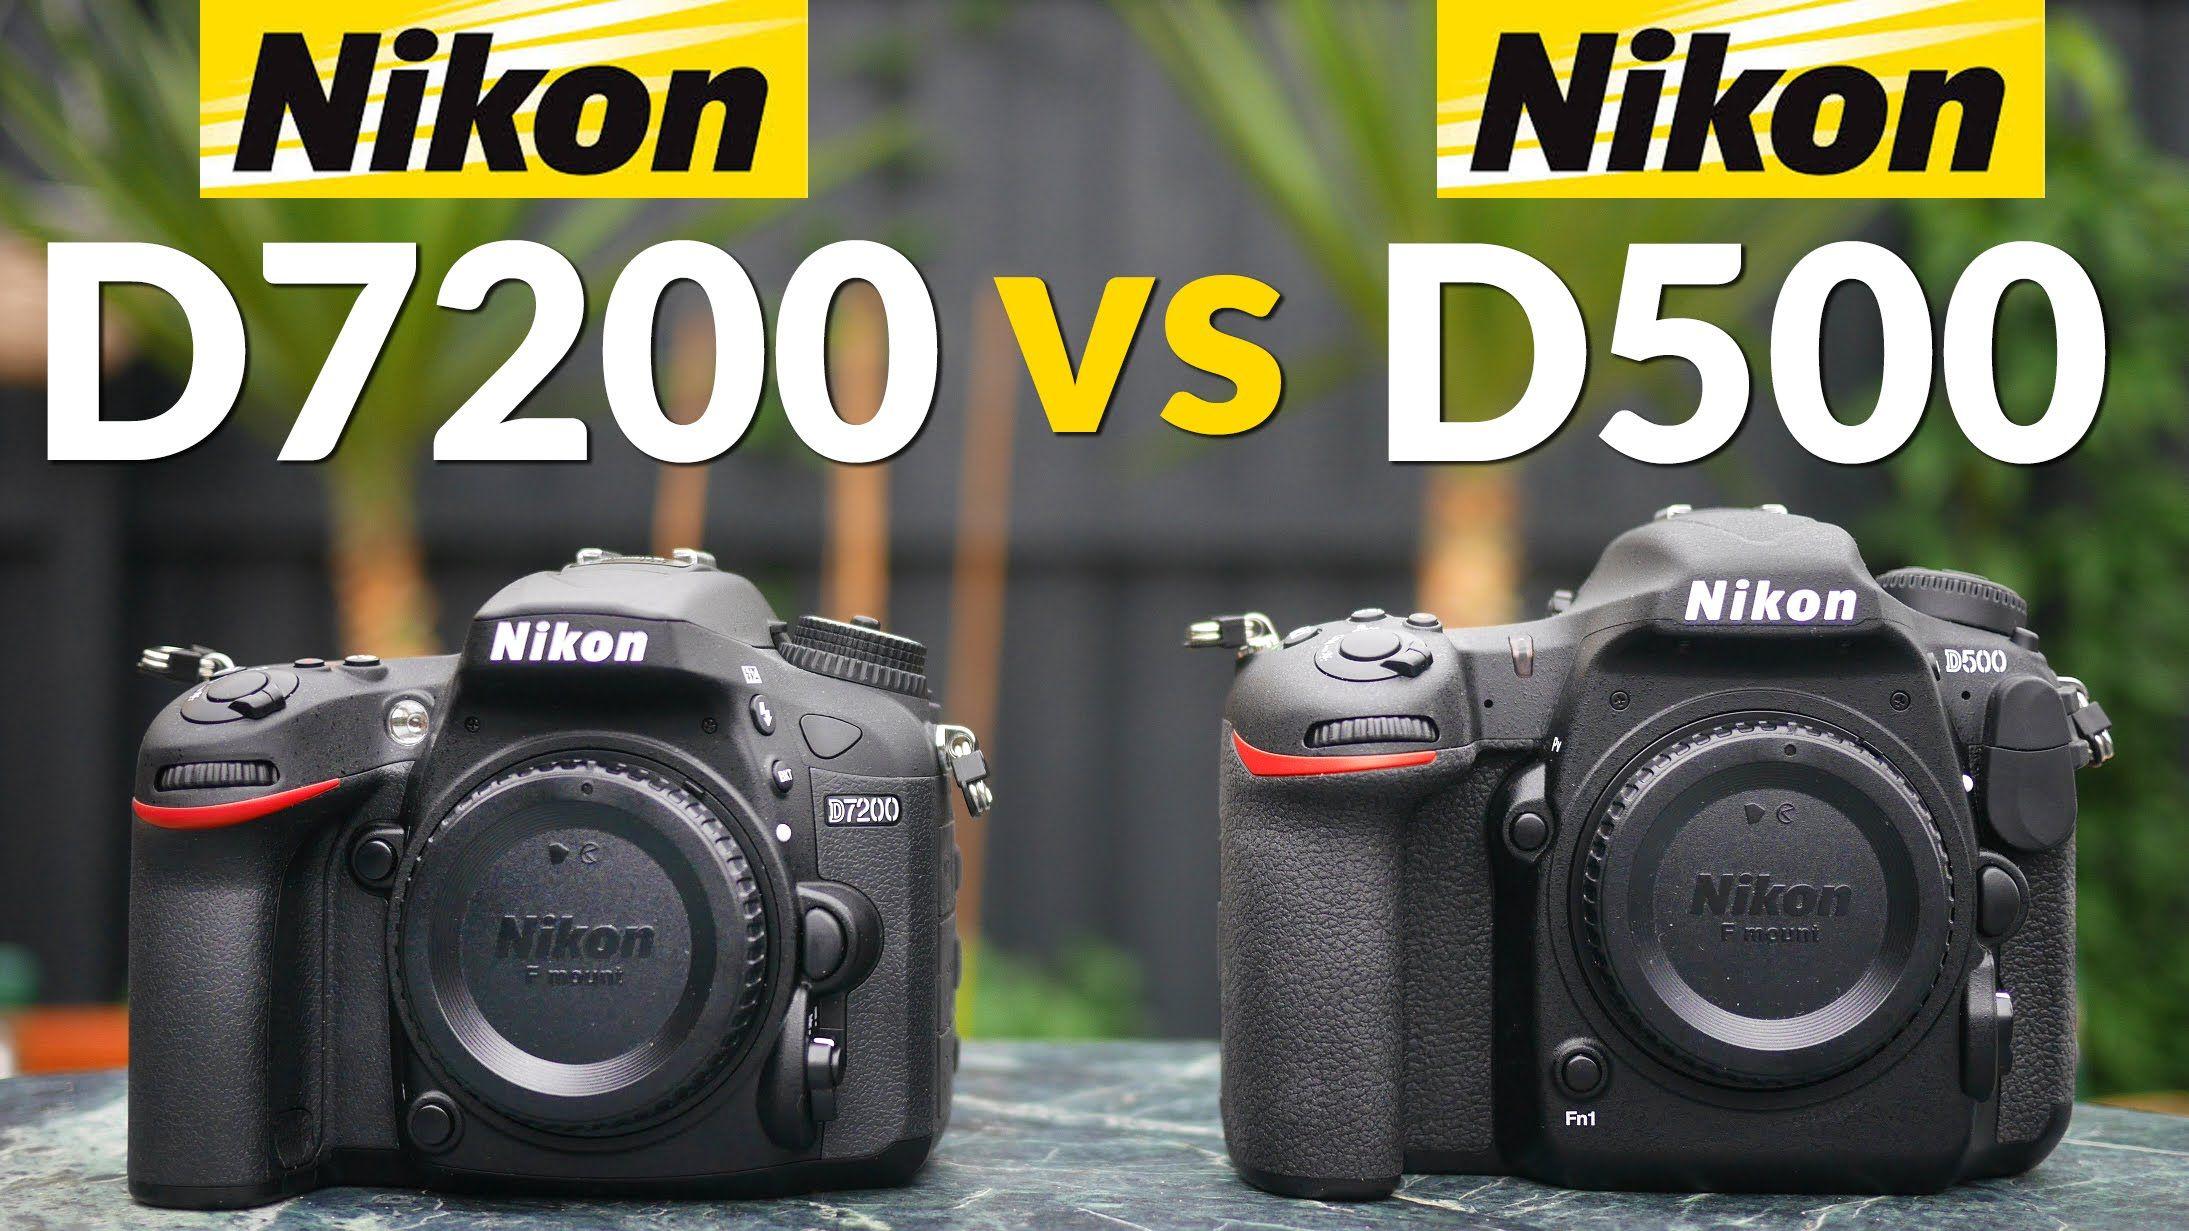 Small Crop Of Canon T6i Vs Nikon D5500